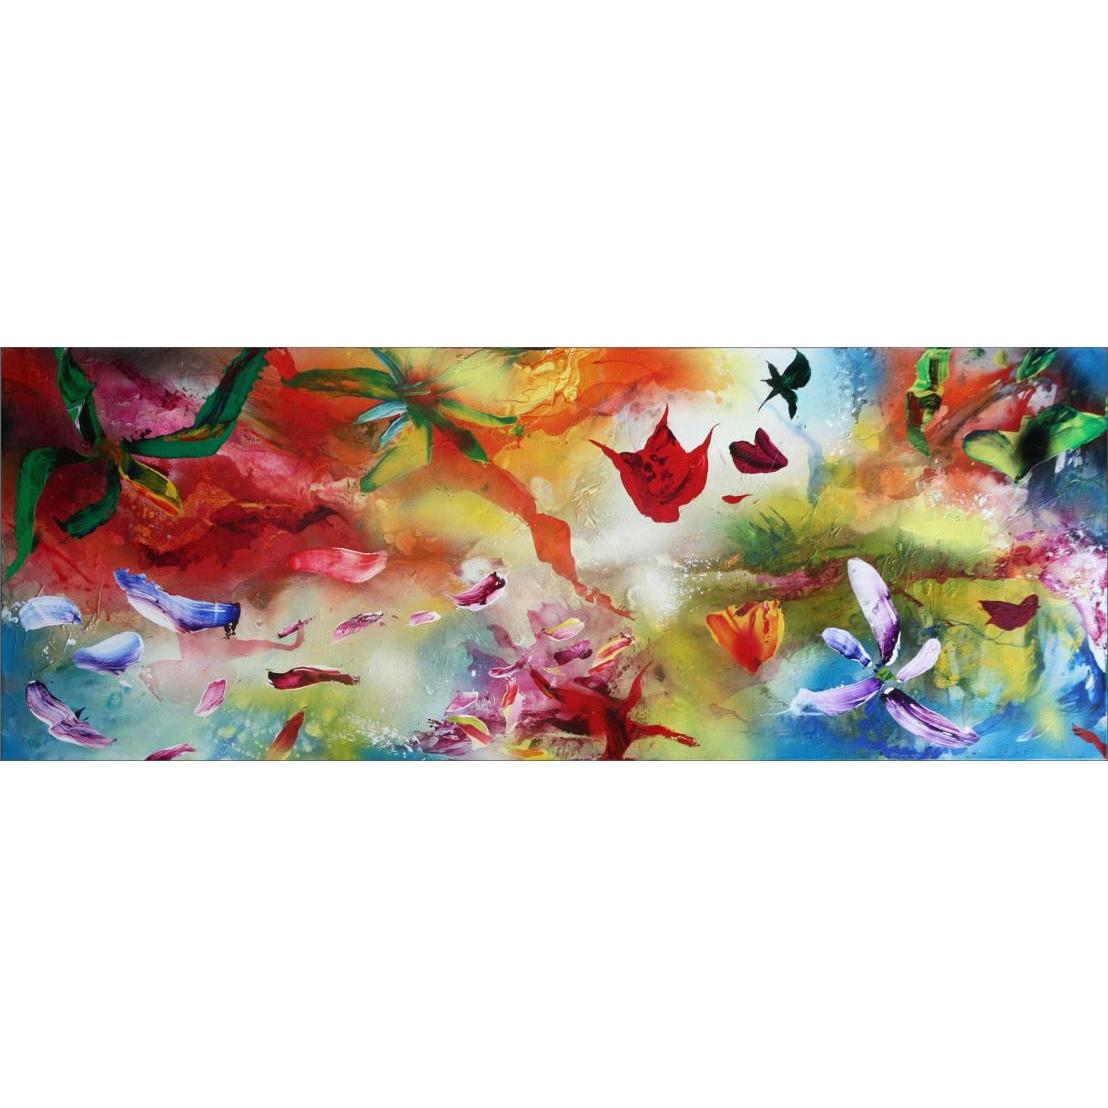 Plamen Bibeschkov schilderij 'Secret live of flowers I'